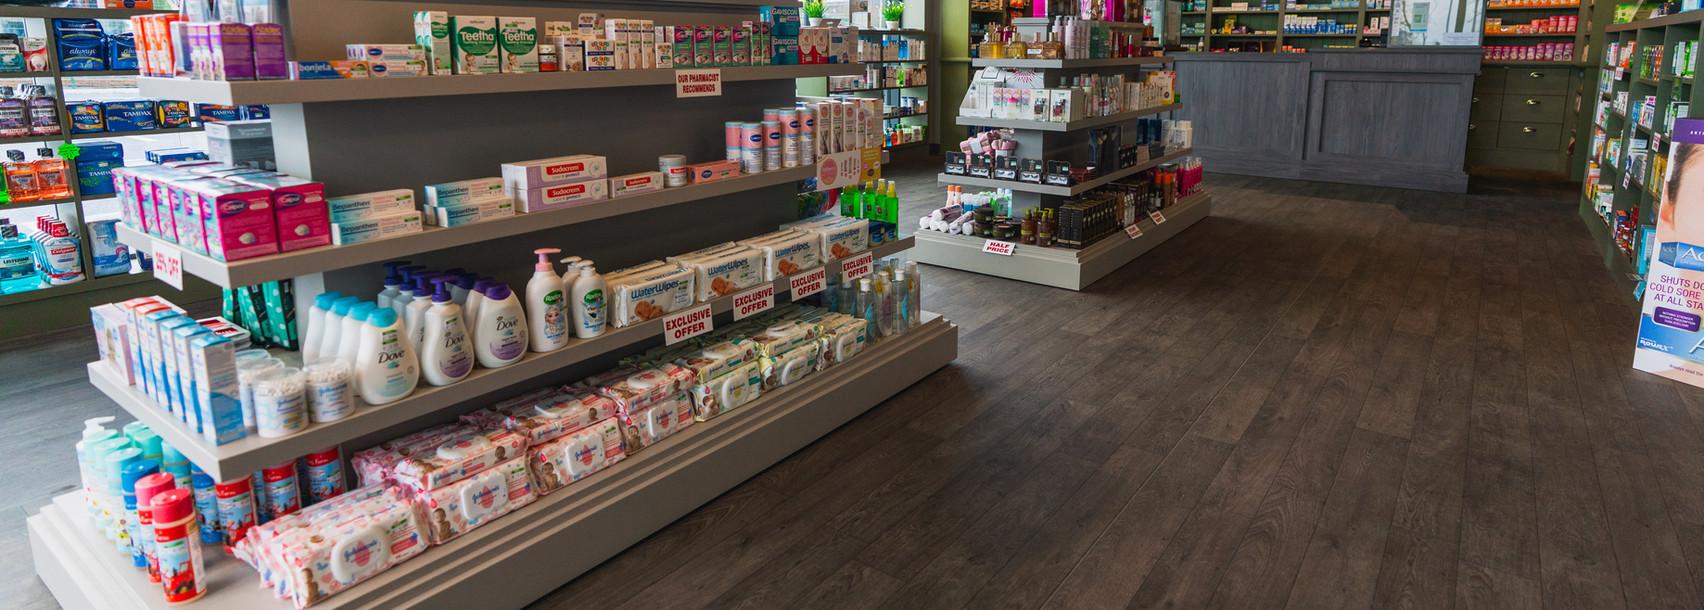 Zest Pharmacy Photos-4451.jpg